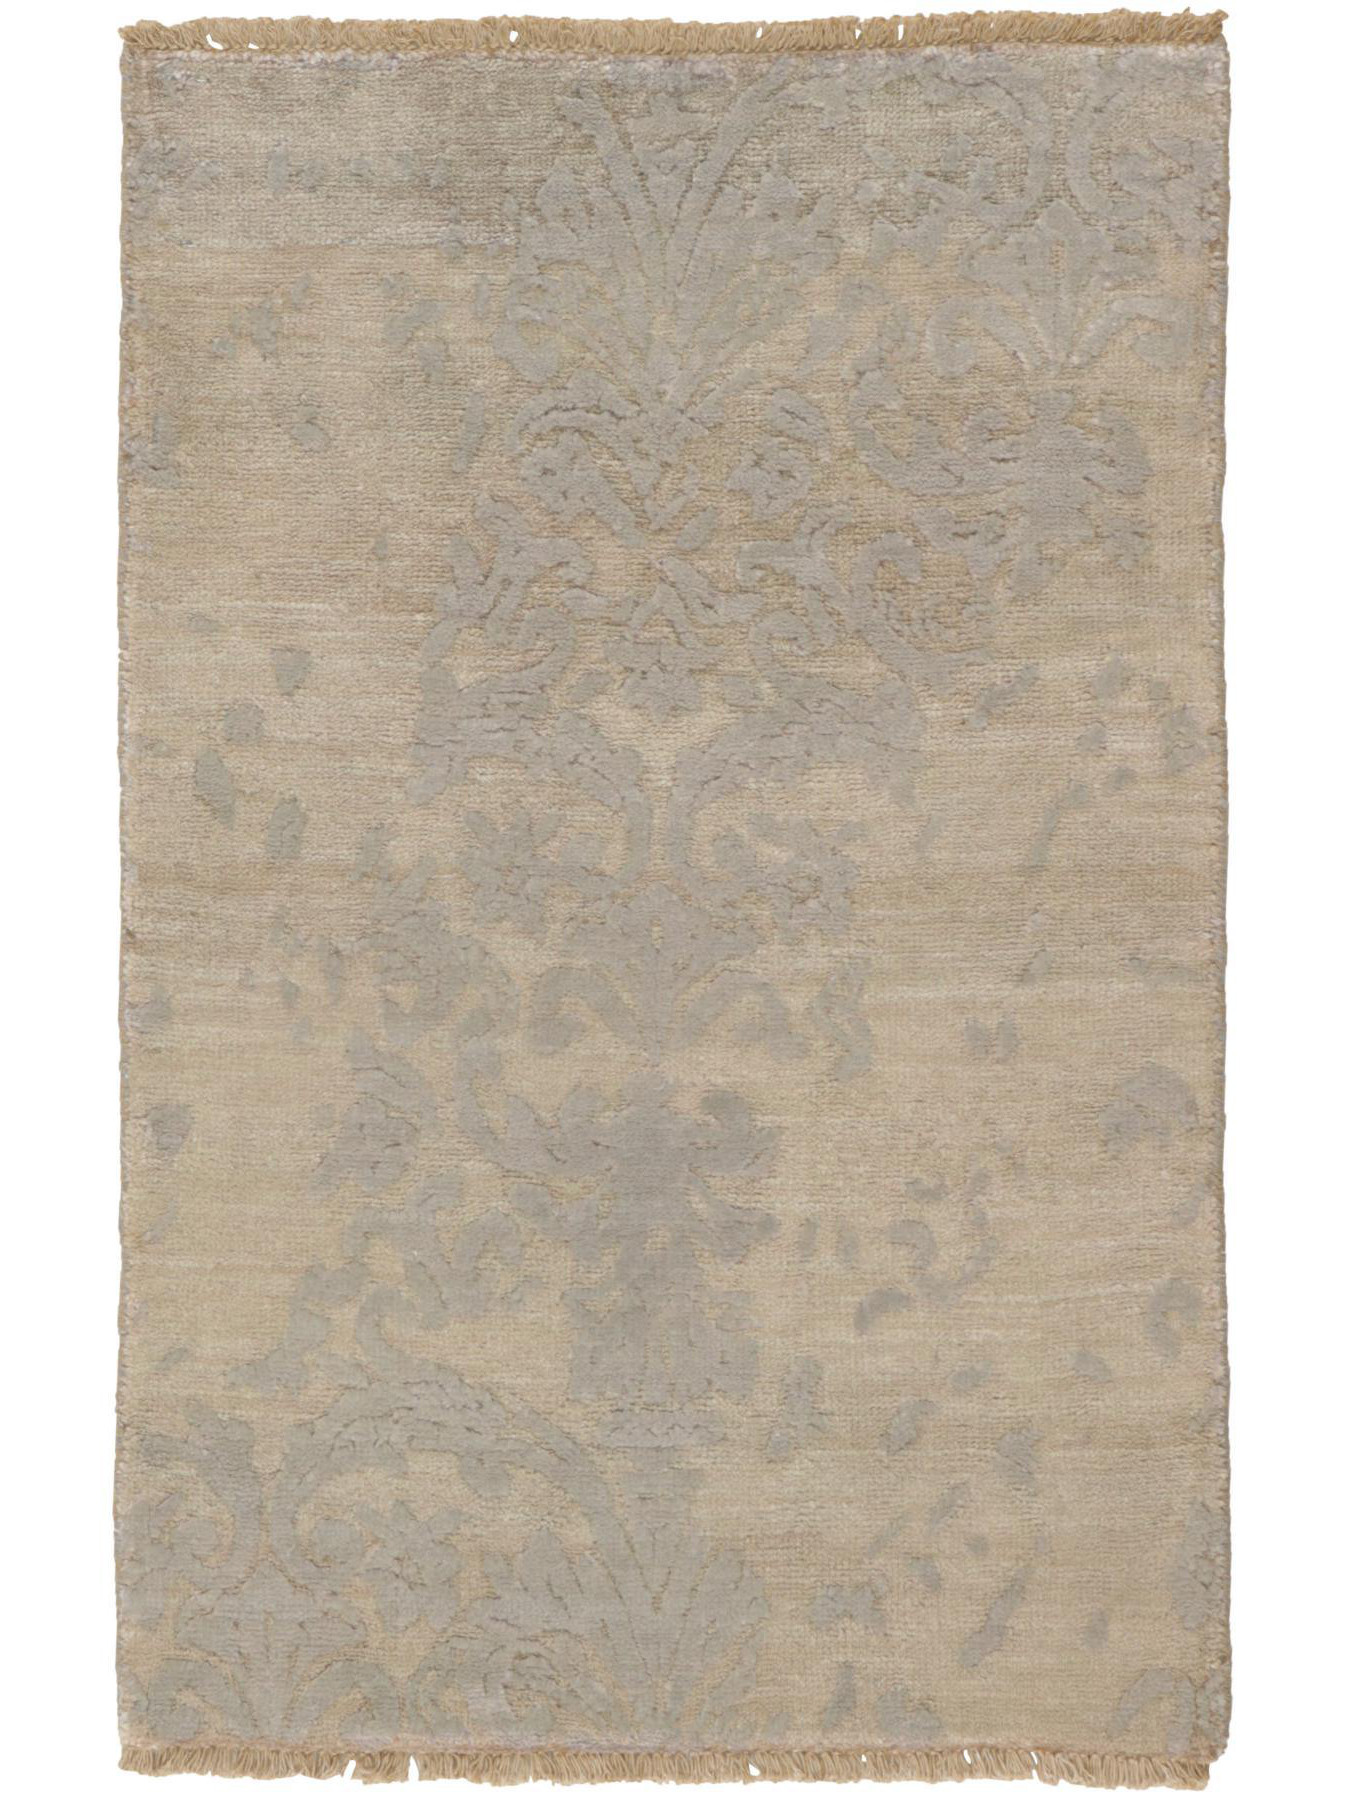 Luxury carpets - Damask-AL-2E B-34/B-33